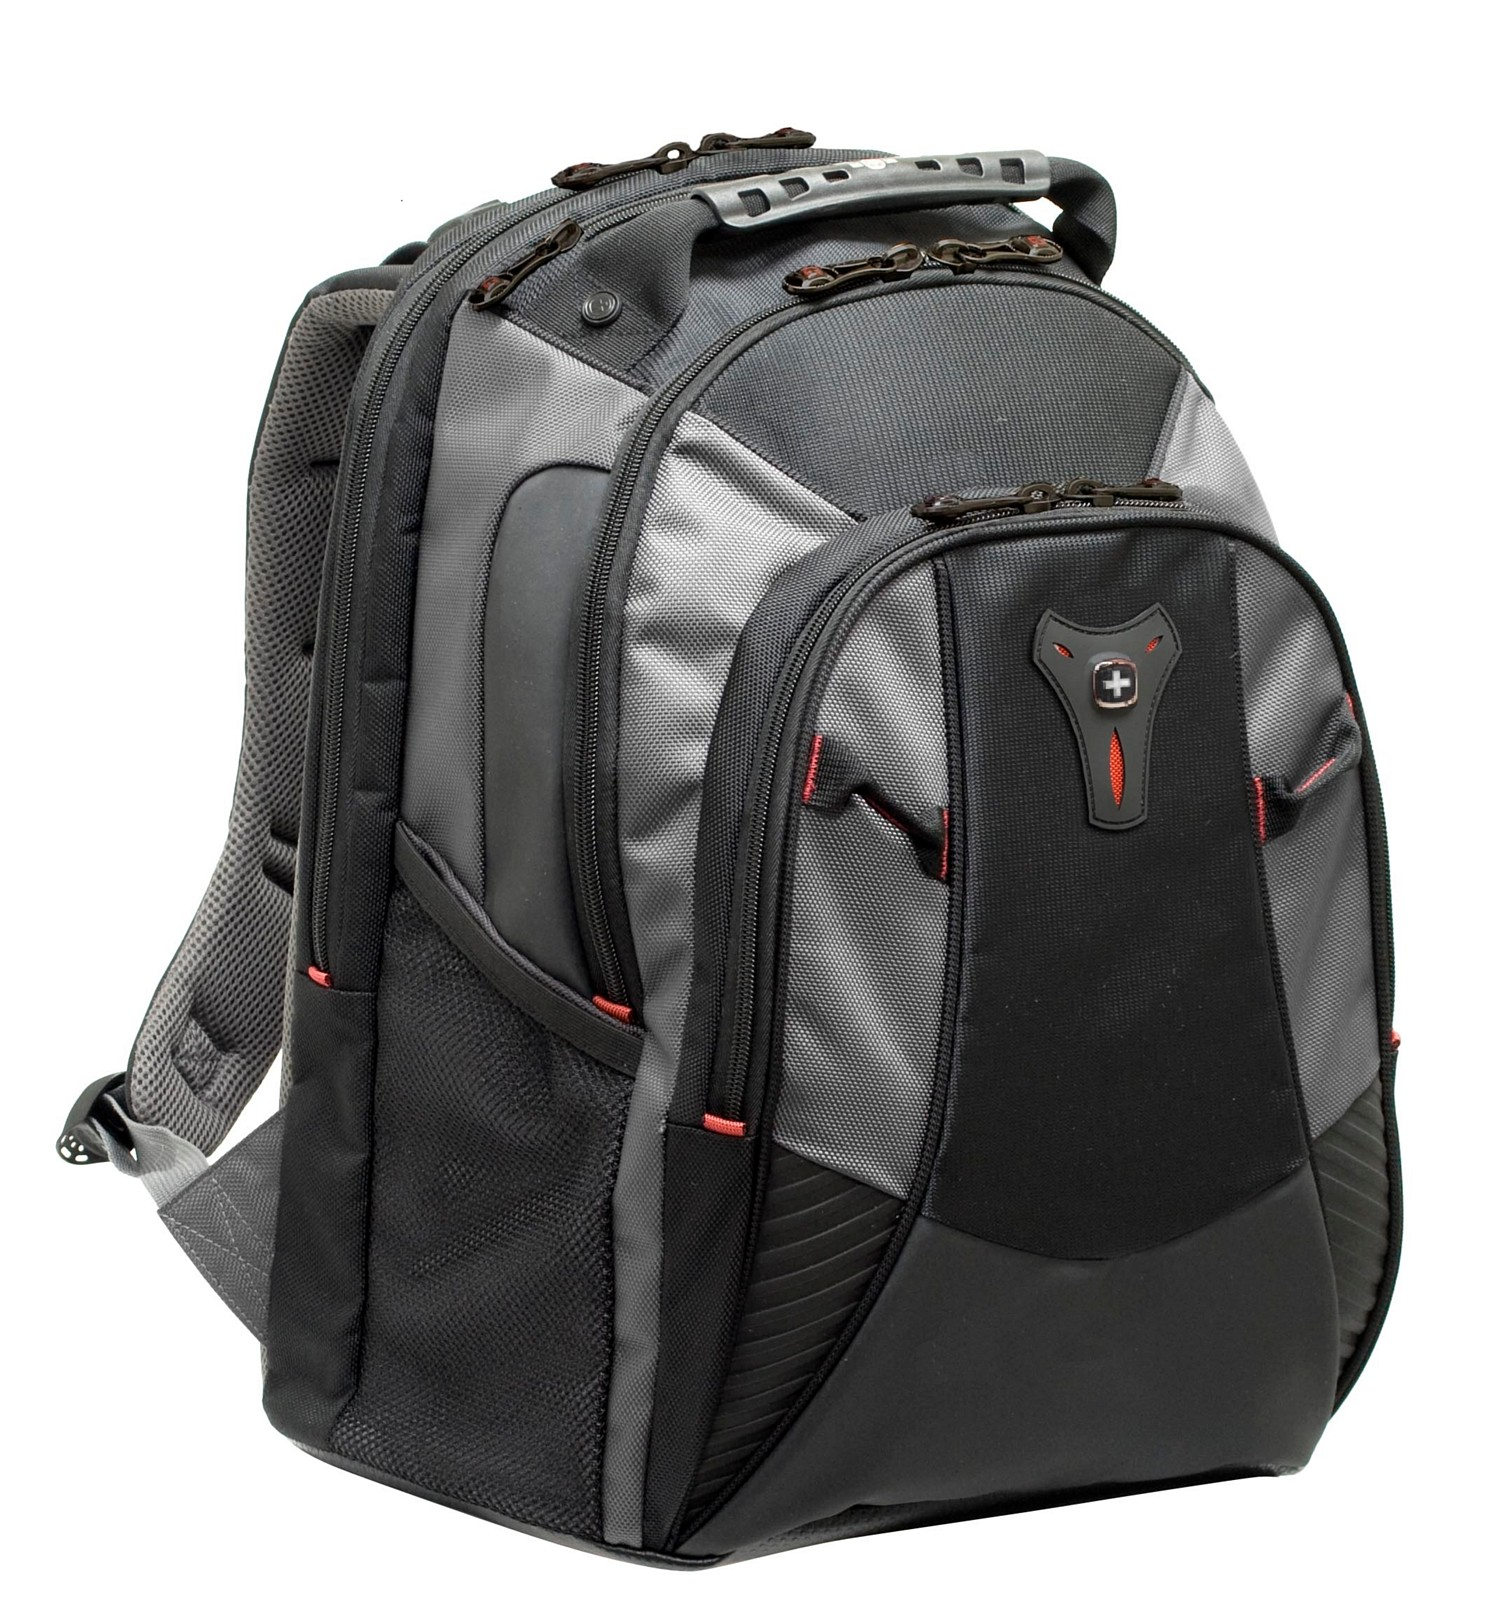 Wenger MYTHOS grey Backpack Notebookrucksack schwarz/grau